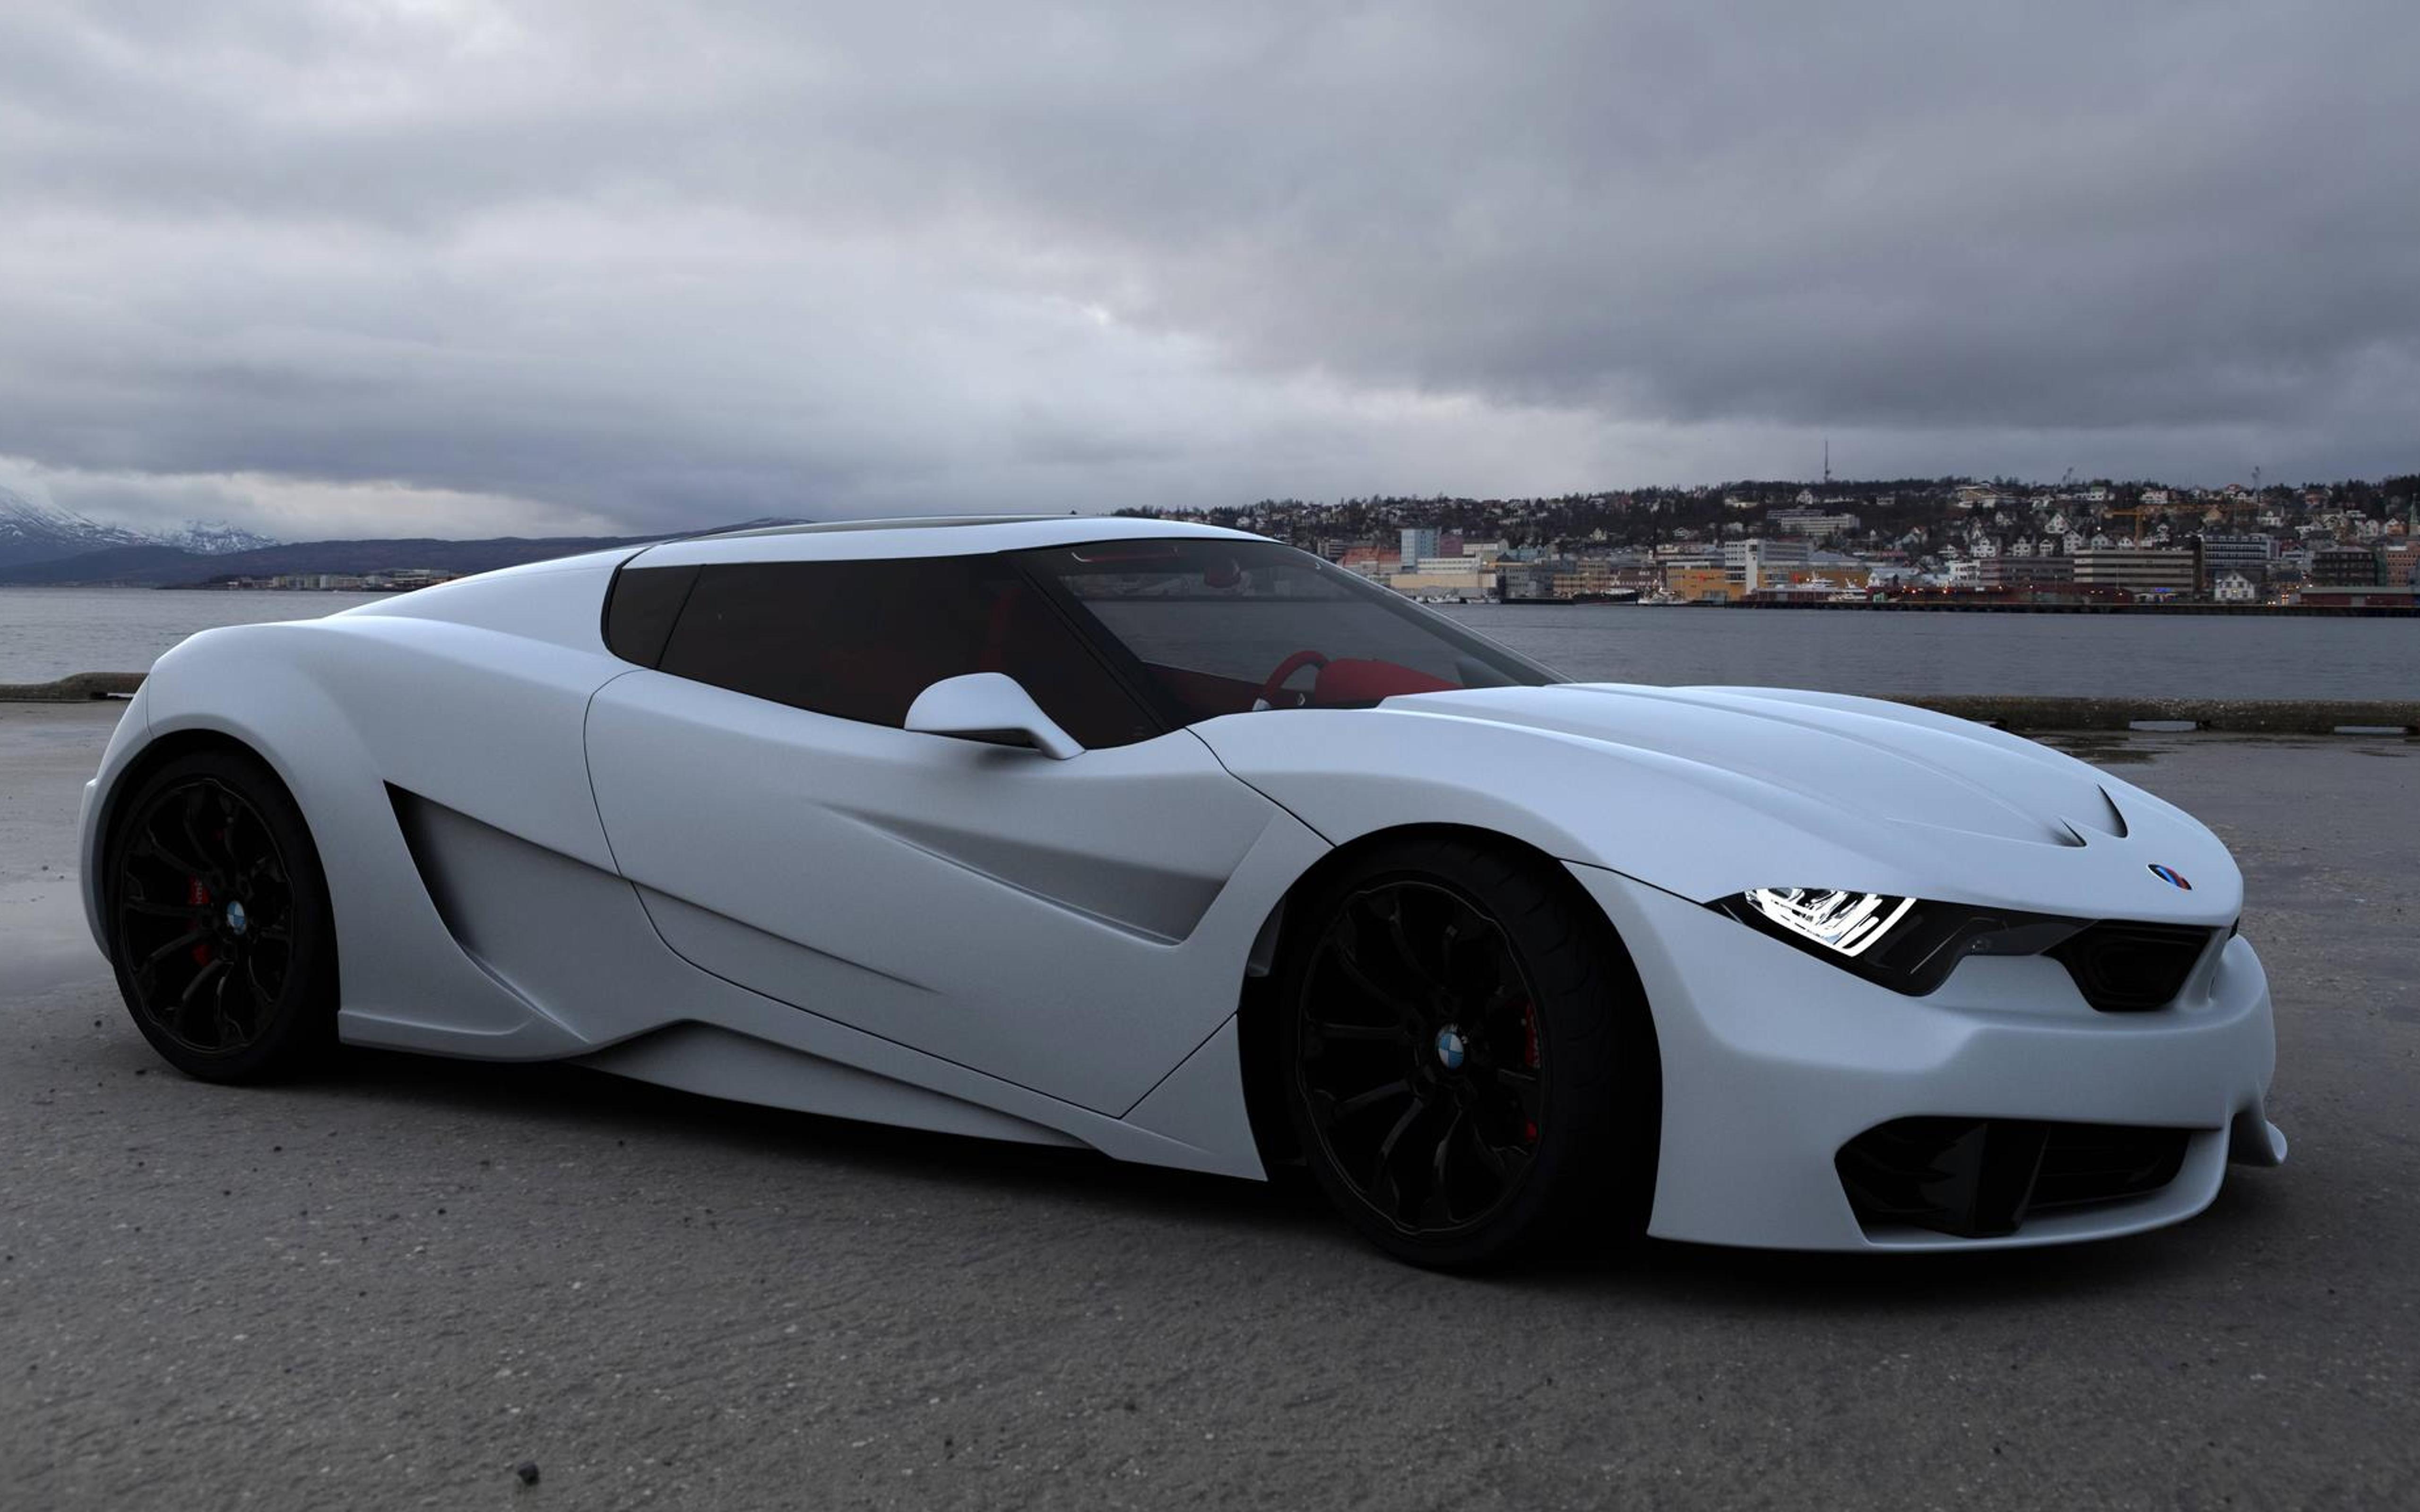 BMW M9 concept on the sea shore Wallpaper Download 5120x3200